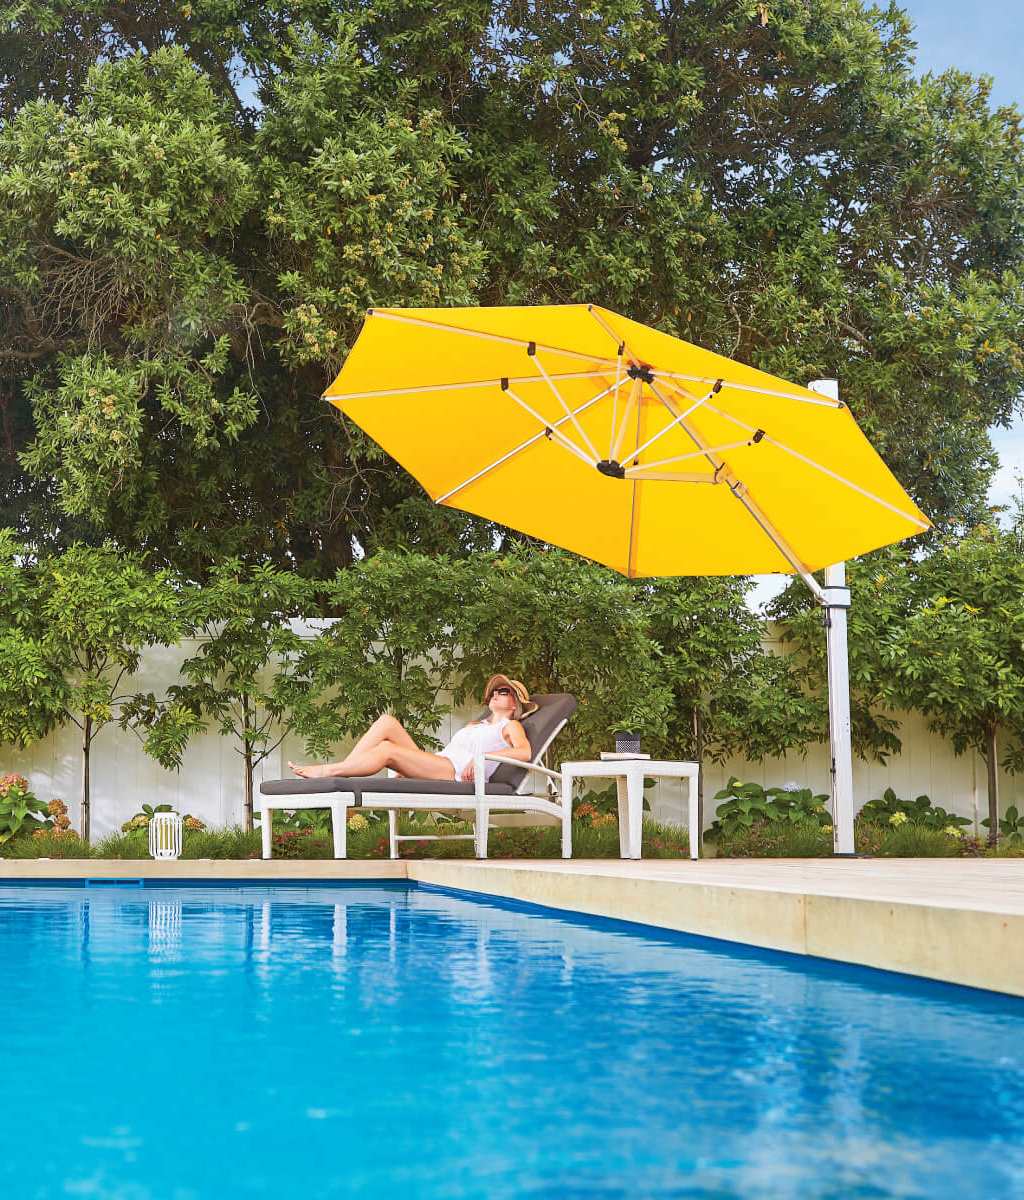 Cantilever Umbrella for Auckland pool